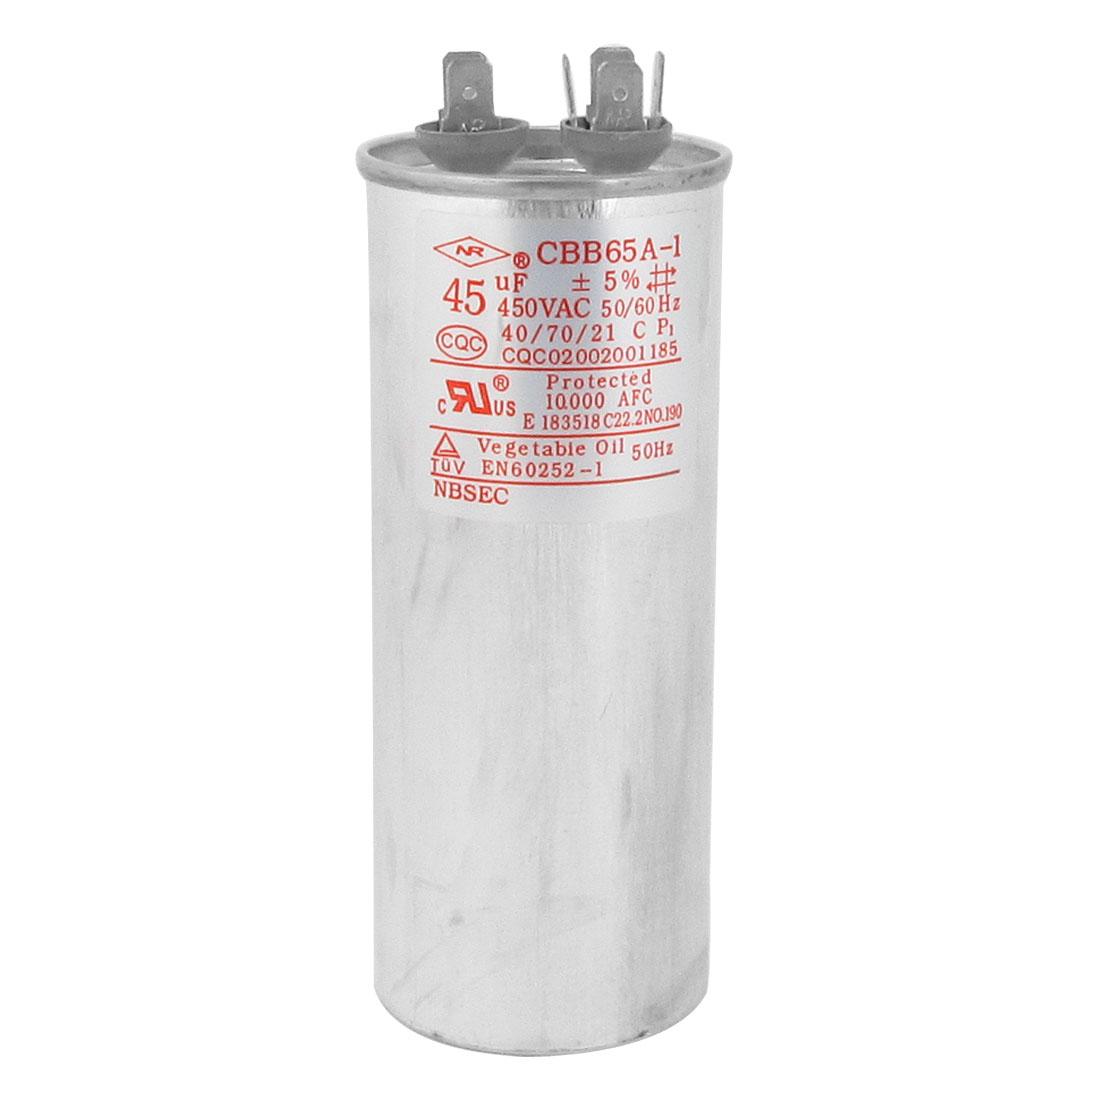 "CBB65A-1 45uF 450V AC 50/60Hz Motor Run Capacitor 5.4"" Long for Air Conditioner"